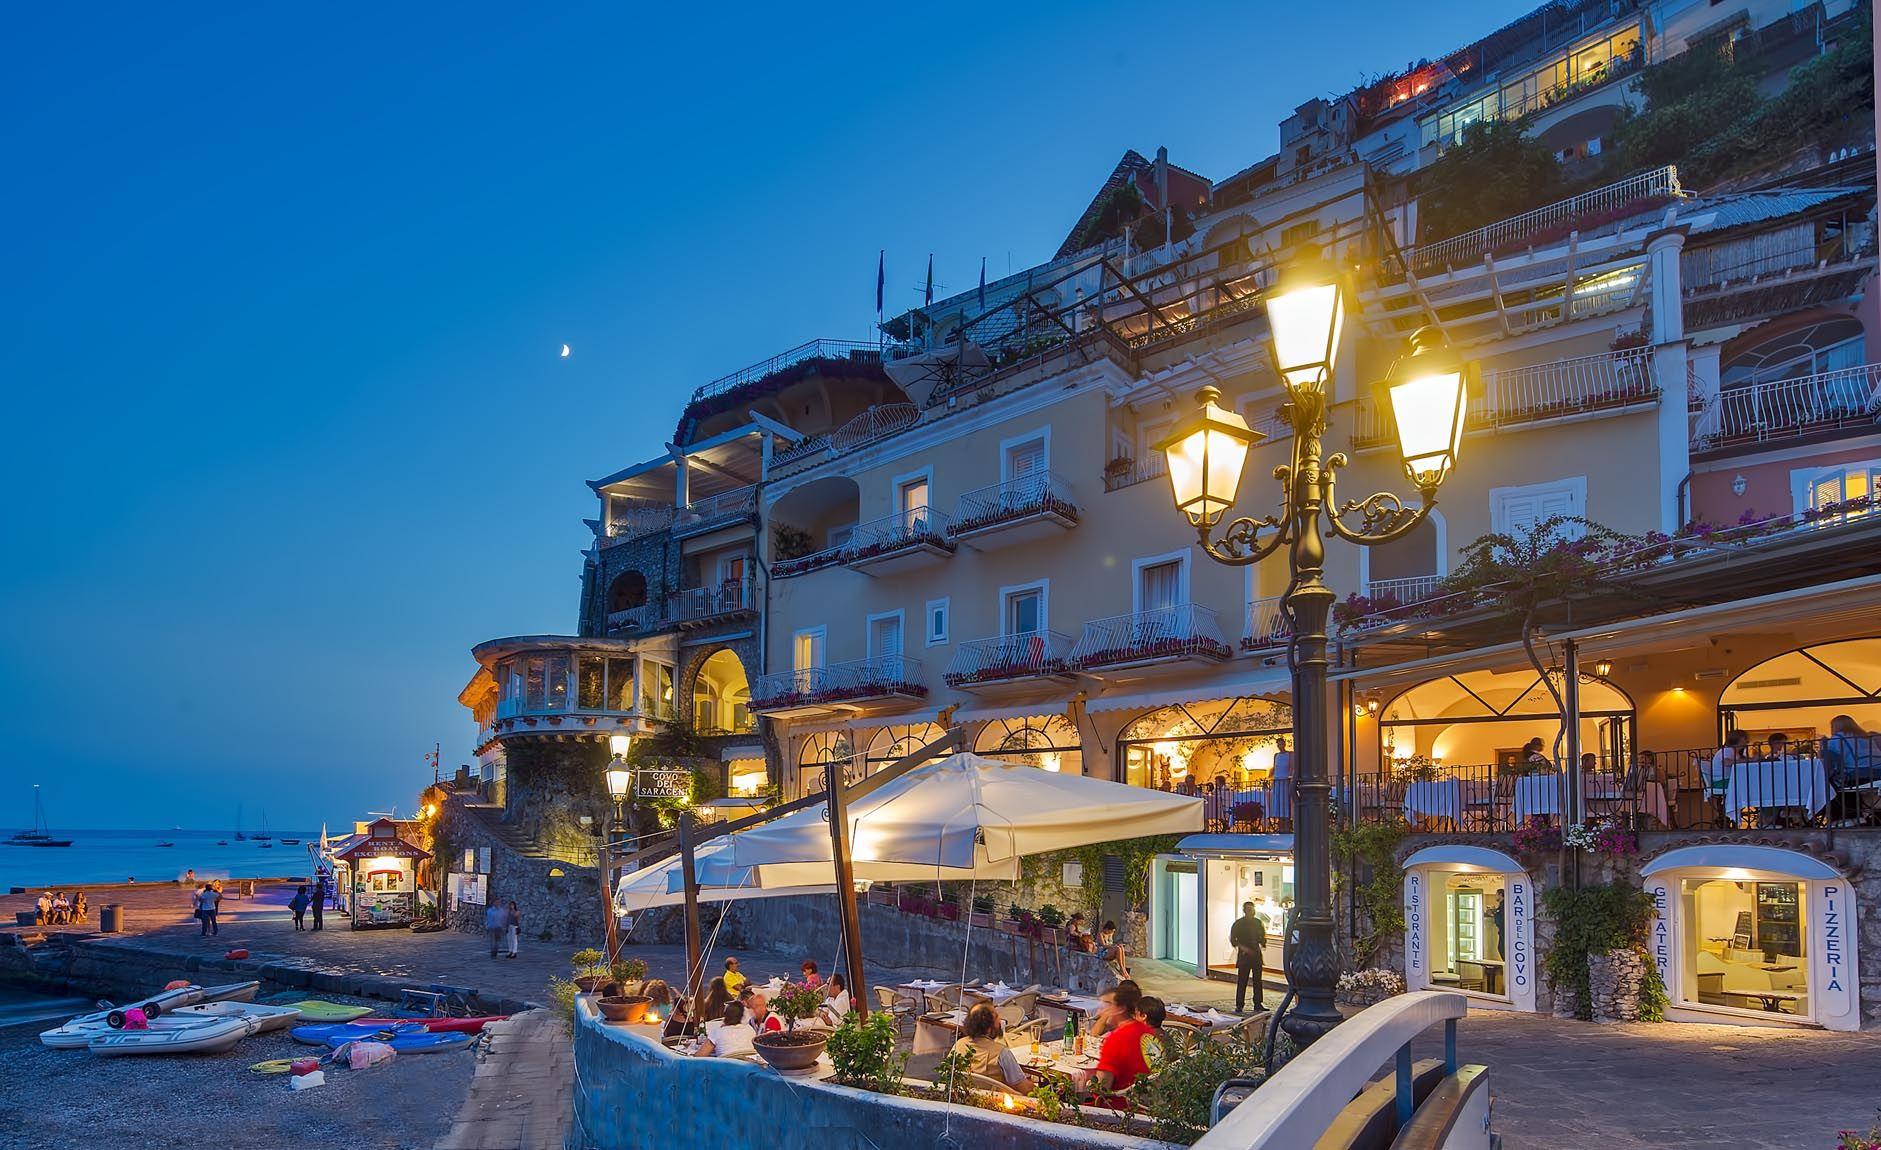 Hotel Covo Dei Saracenipositano Hotels 5 Star Best Luxury Hotels